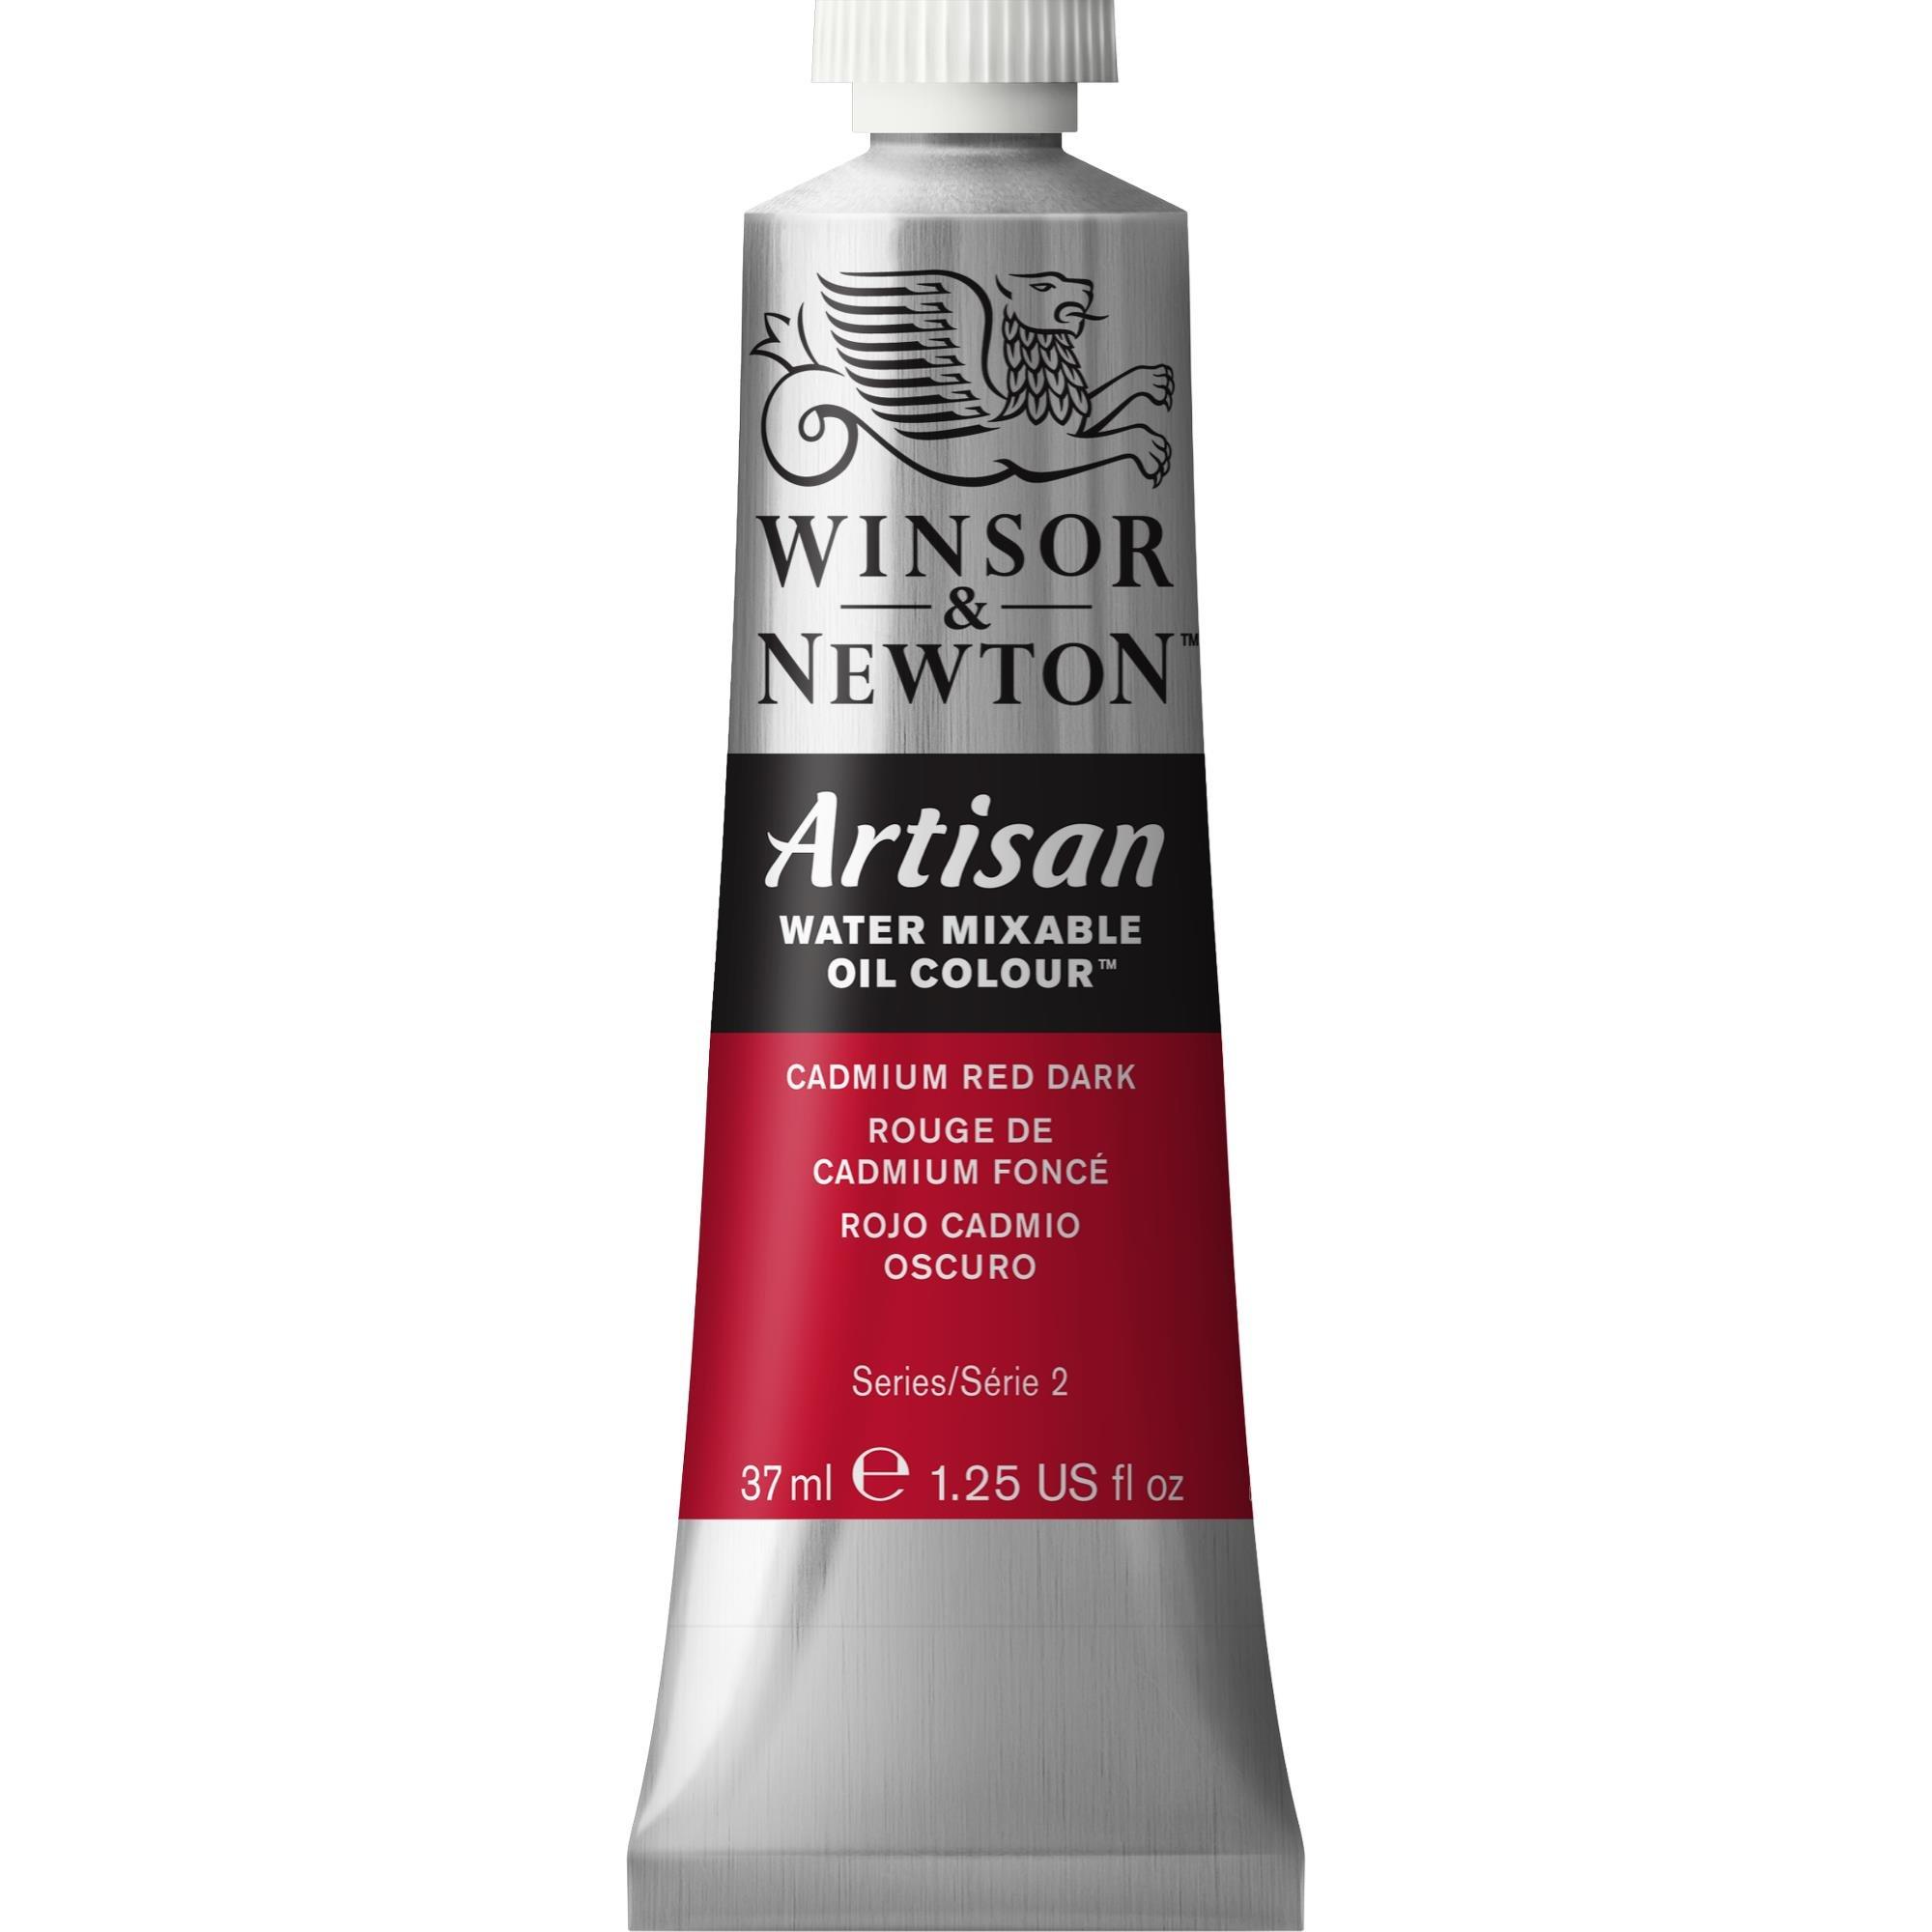 Winsor & Newton Artisan Water Mixable Oil Colour, 37ml Tube, Cadmium Red Dark